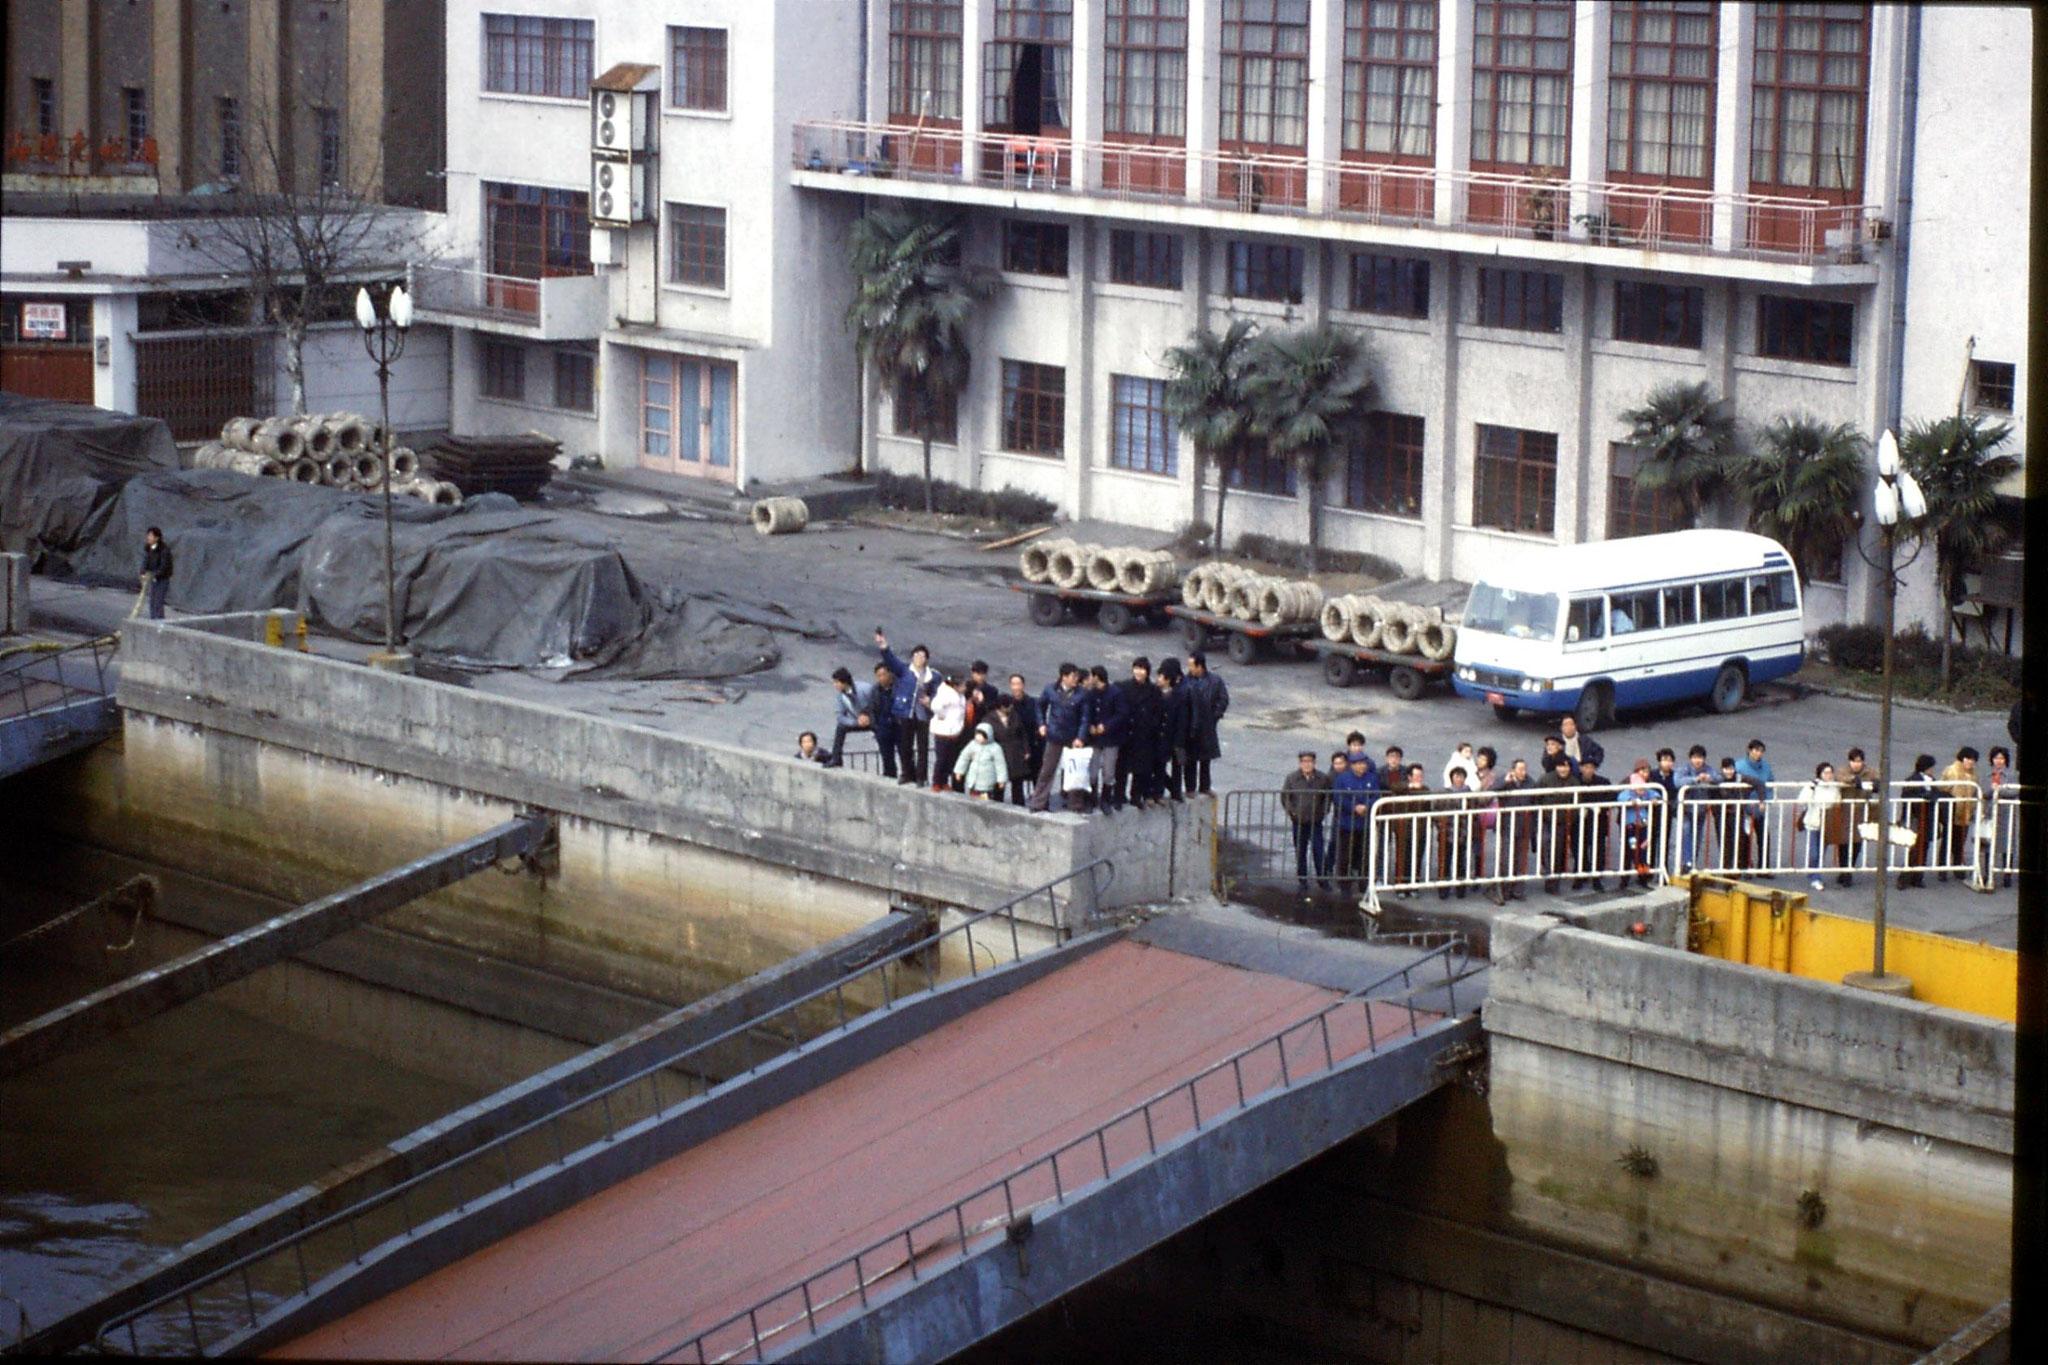 9/2/1989: 23: arrival in Shanghai